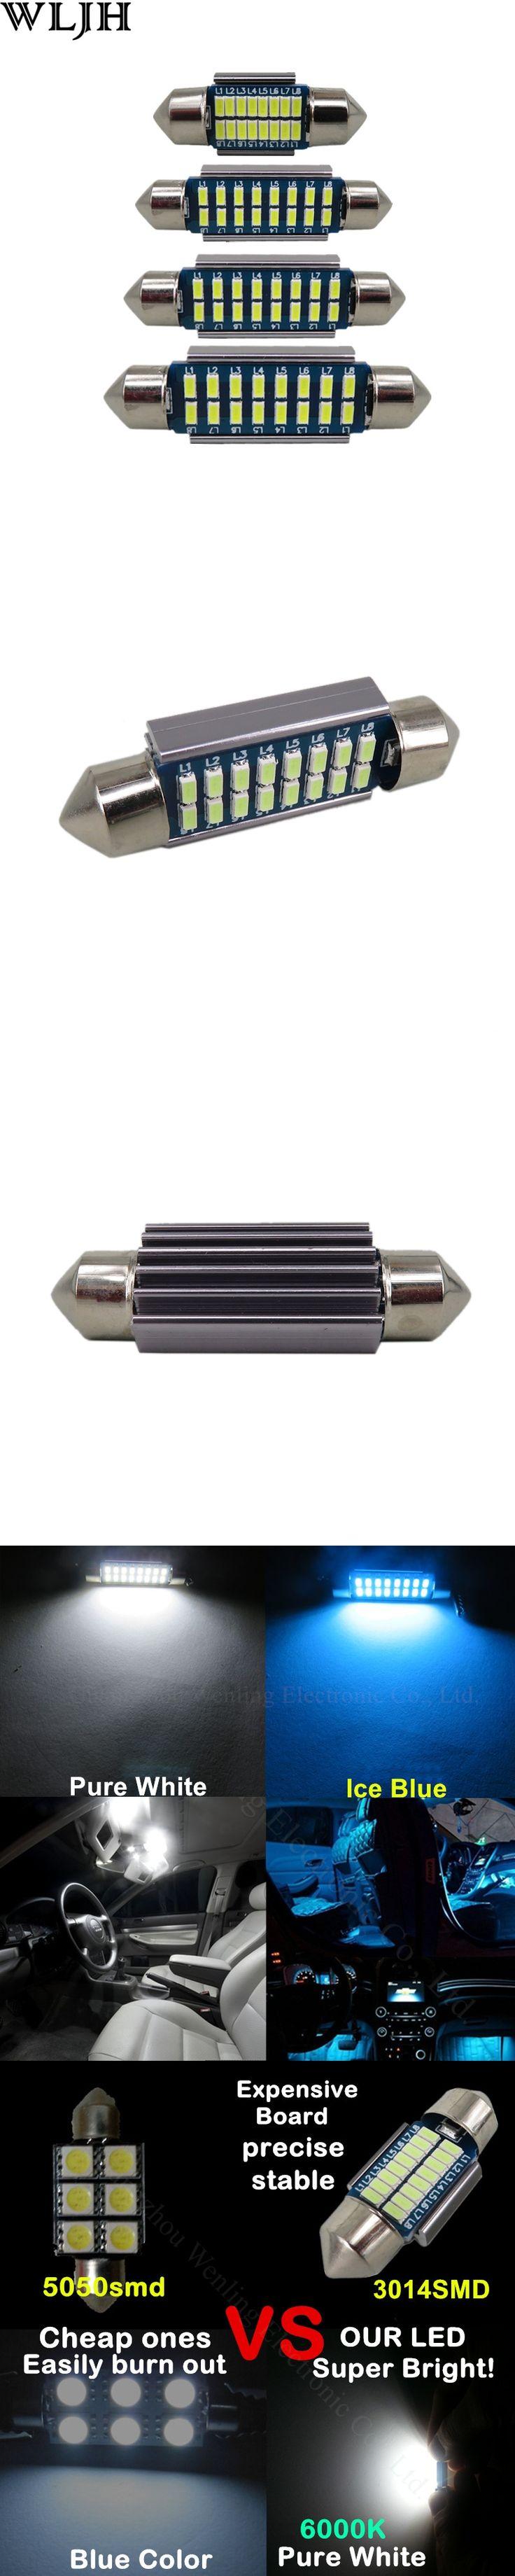 WLJH 4X Canbus Bulb No Error 31mm 36mm 39mm 42mm SV8,5 C10W C5W Led 12V SMD 3014 Auto Lamp Lighting Car Interior External Light